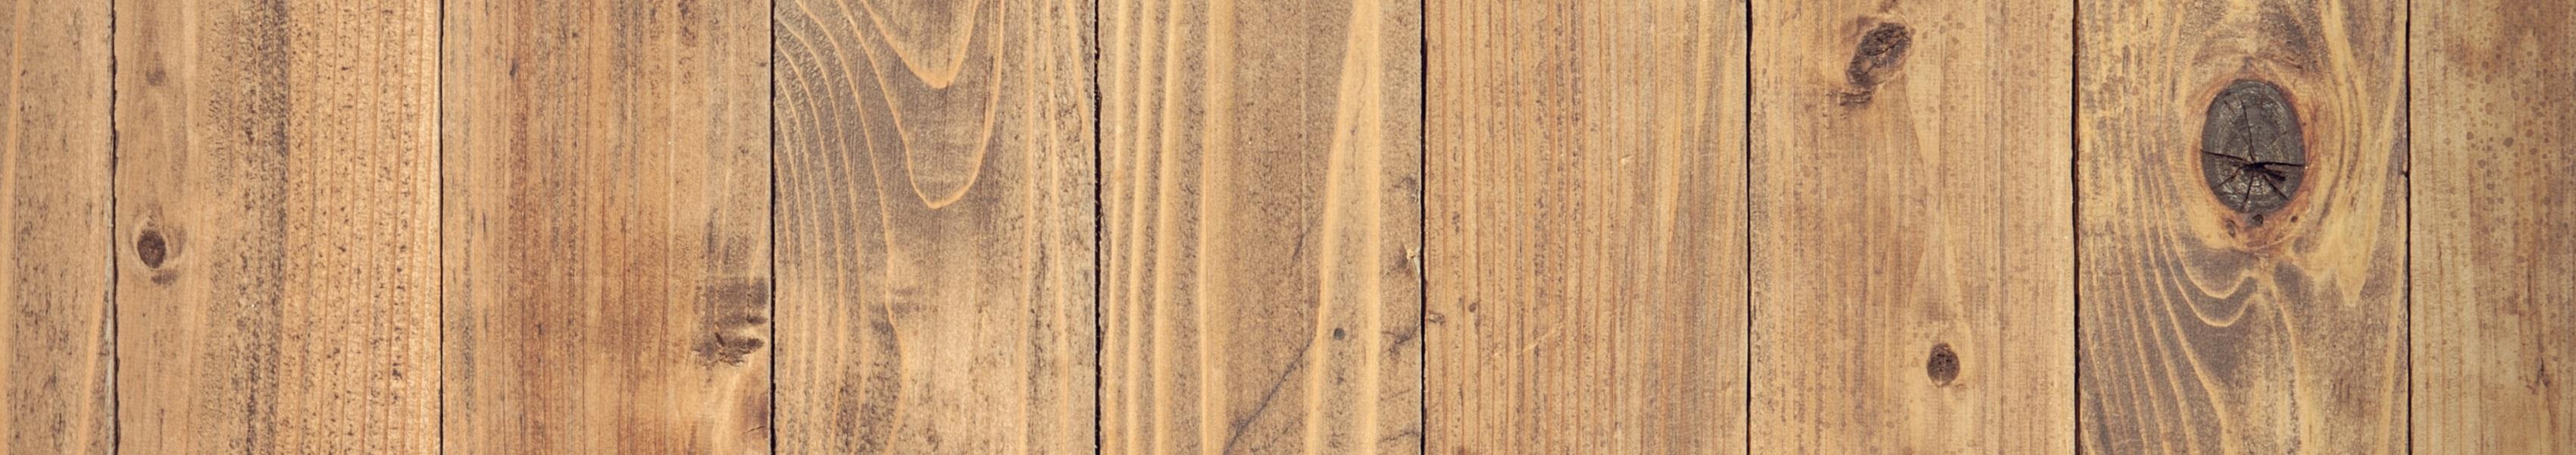 75mm x 44mm (3 x 2) Timber